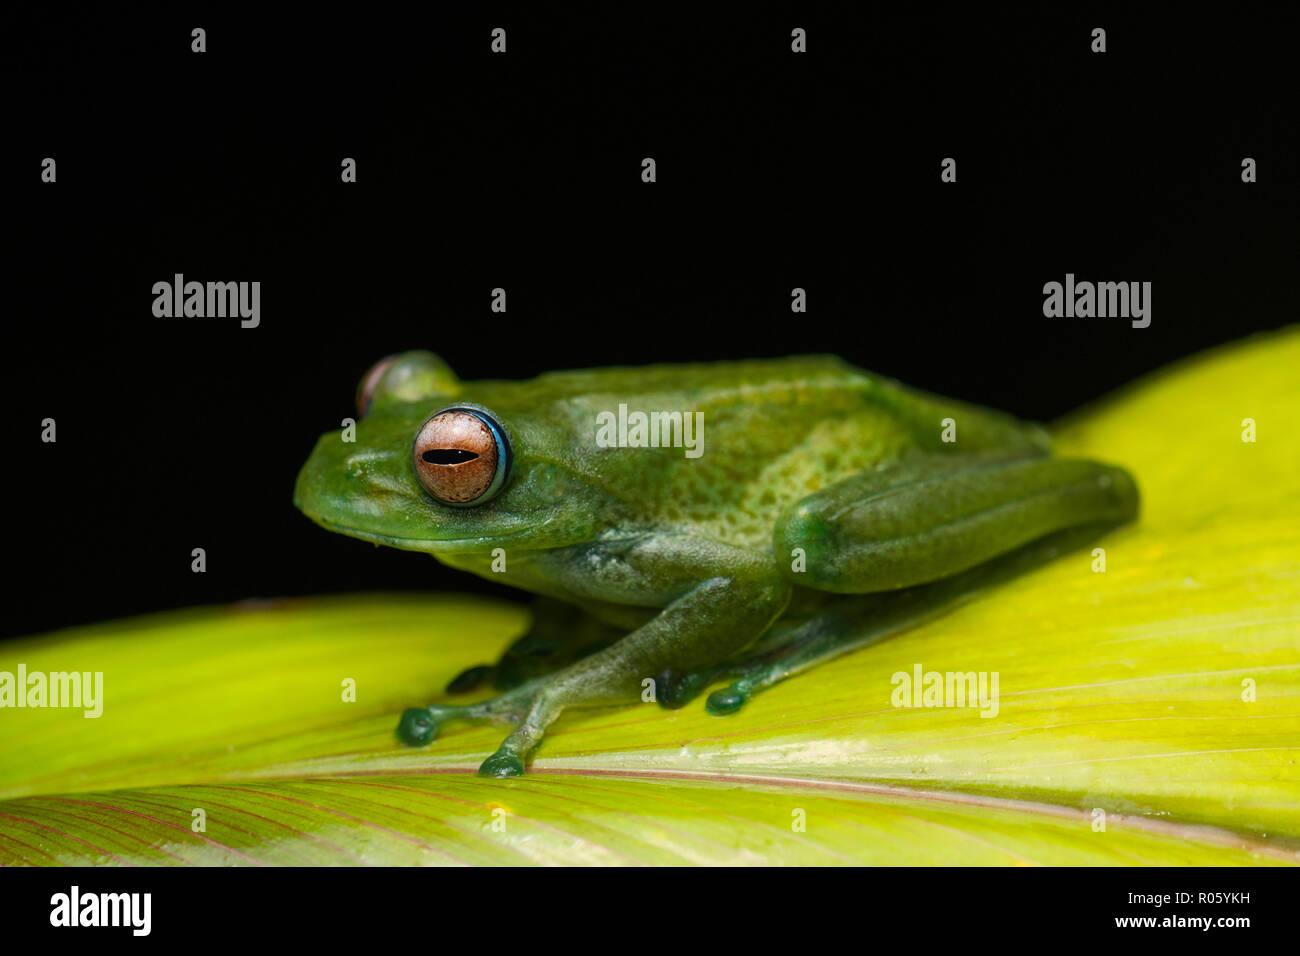 A frog (Boophis eninea) on leaf, Ranomafana National Park, Southeast Madagascar, Madagascar - Stock Image